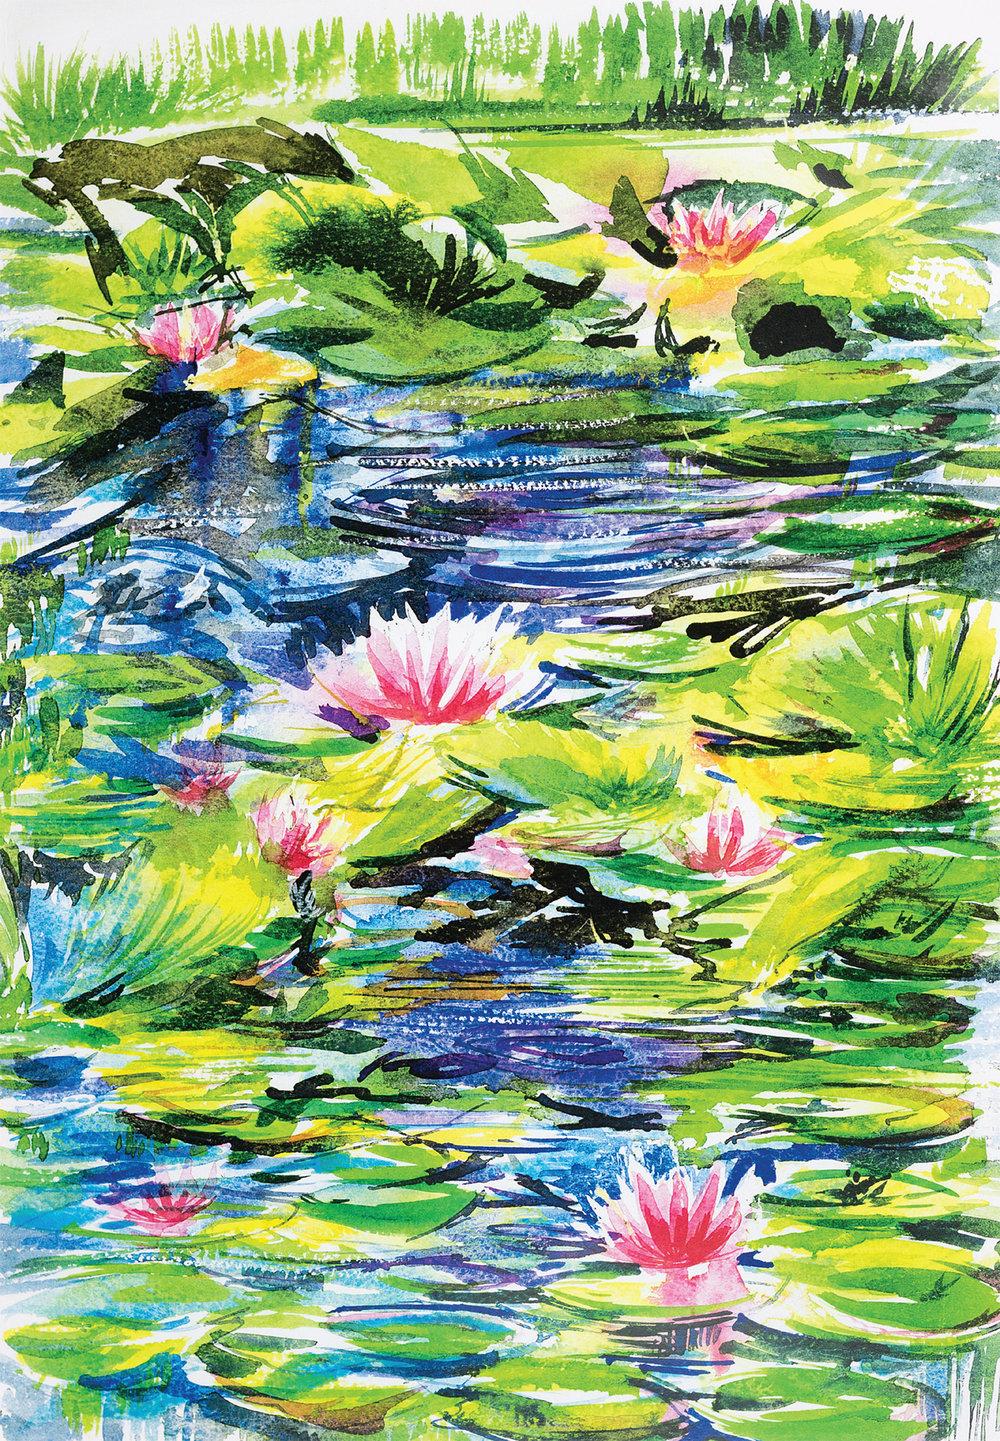 gerald-porter-watercolour-plants-1.jpg